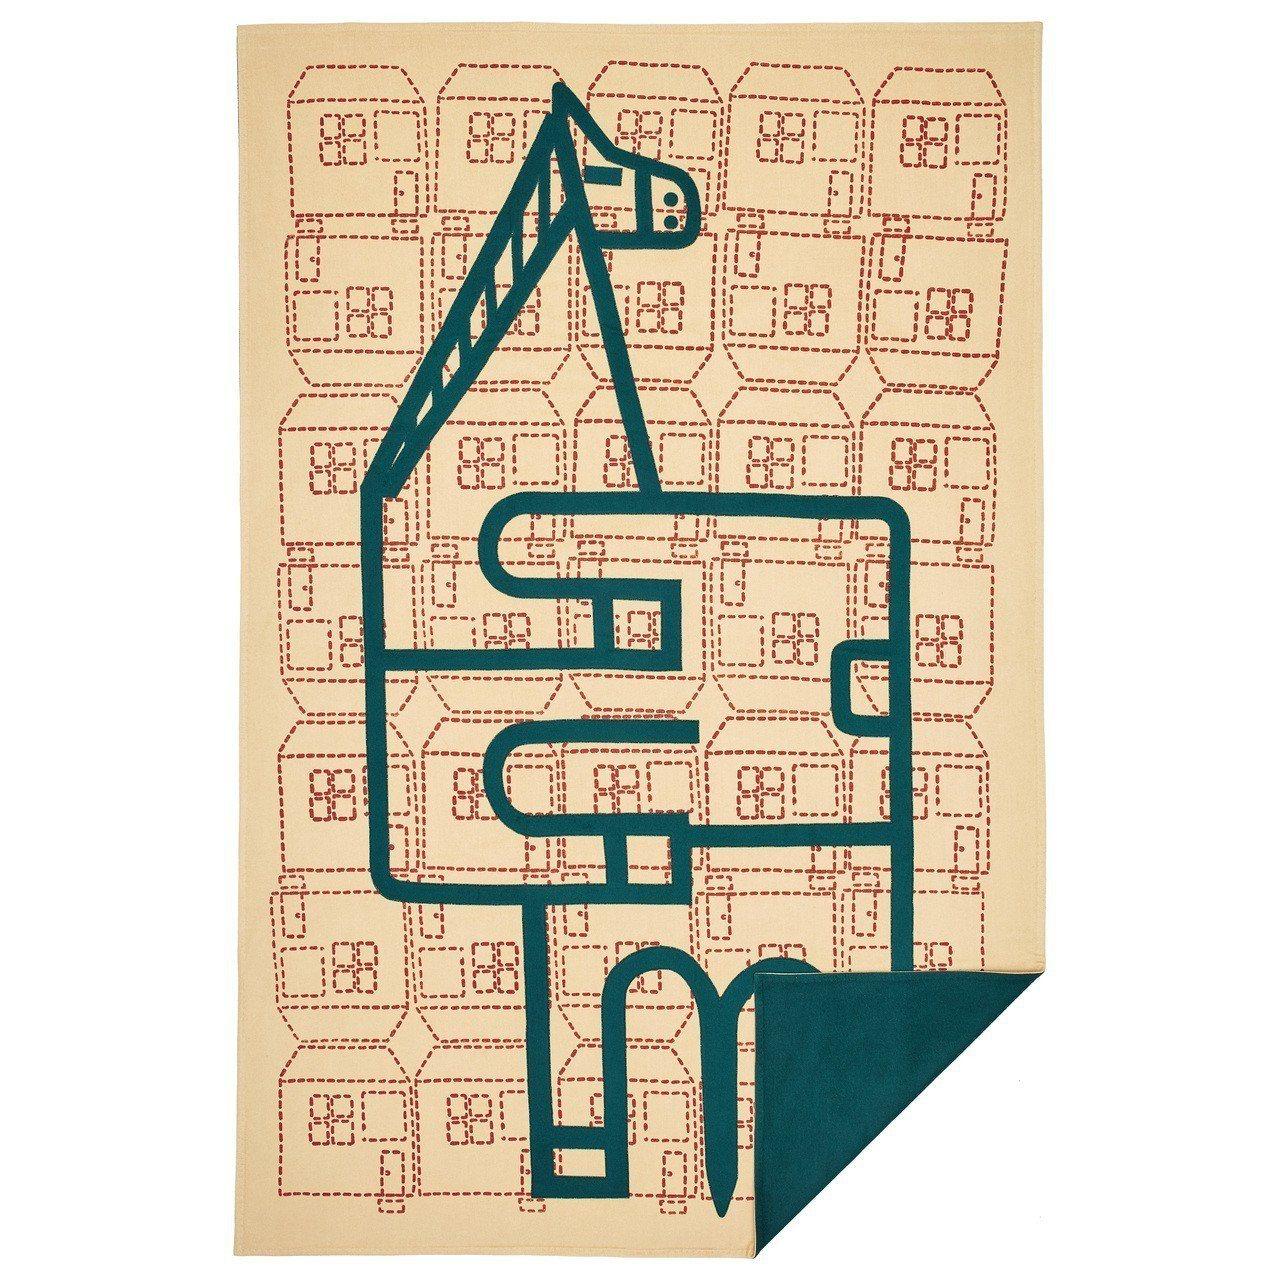 Orizaba圖紋珍稀刺繡限量款披毯。圖/愛馬仕提供